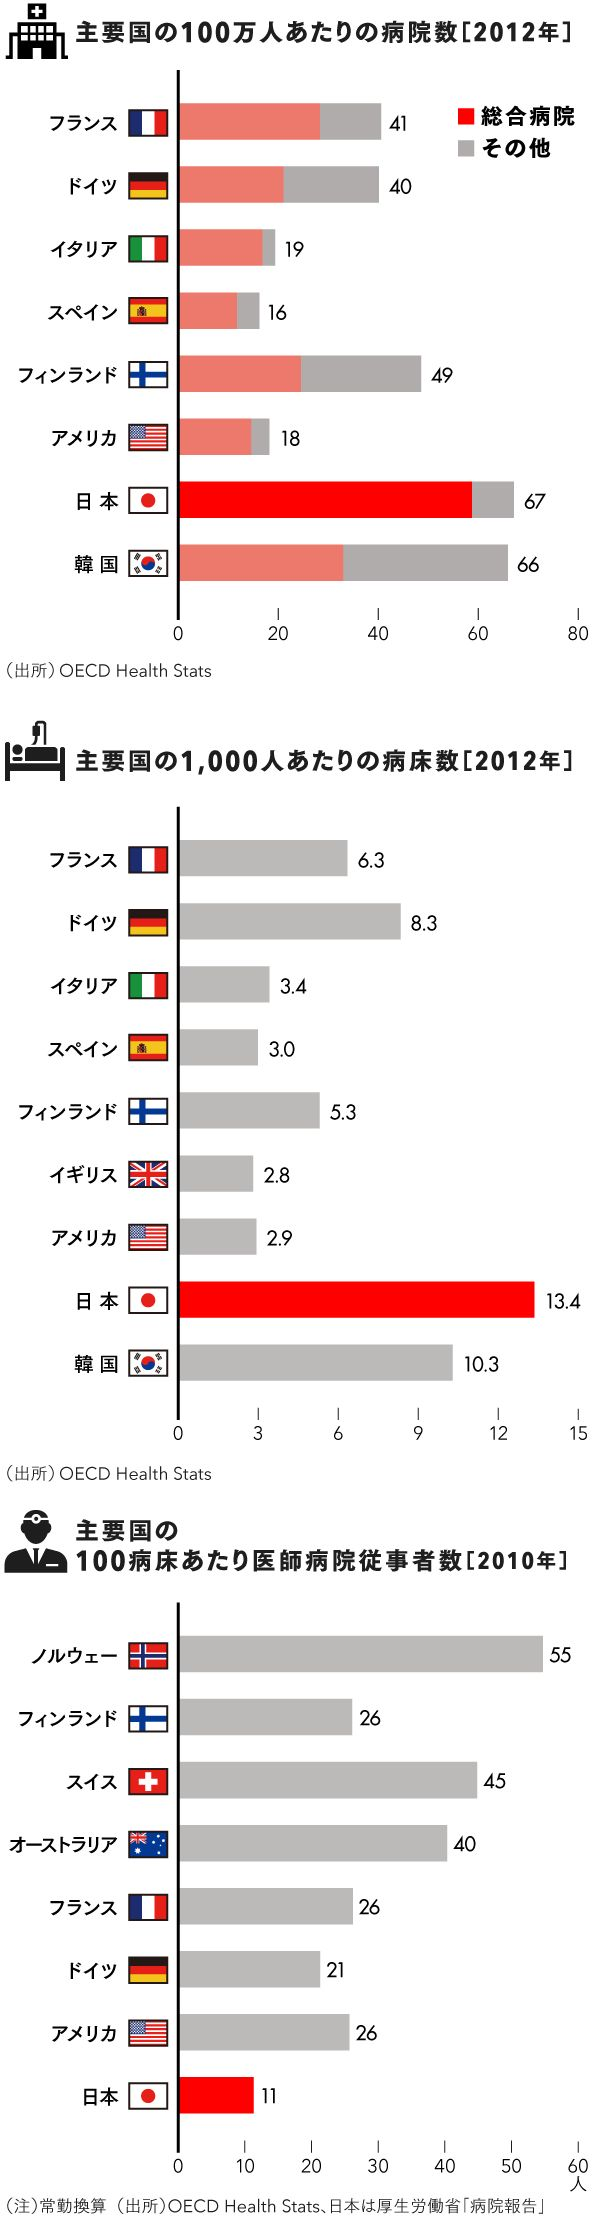 grp04_主要国との比較 (5)